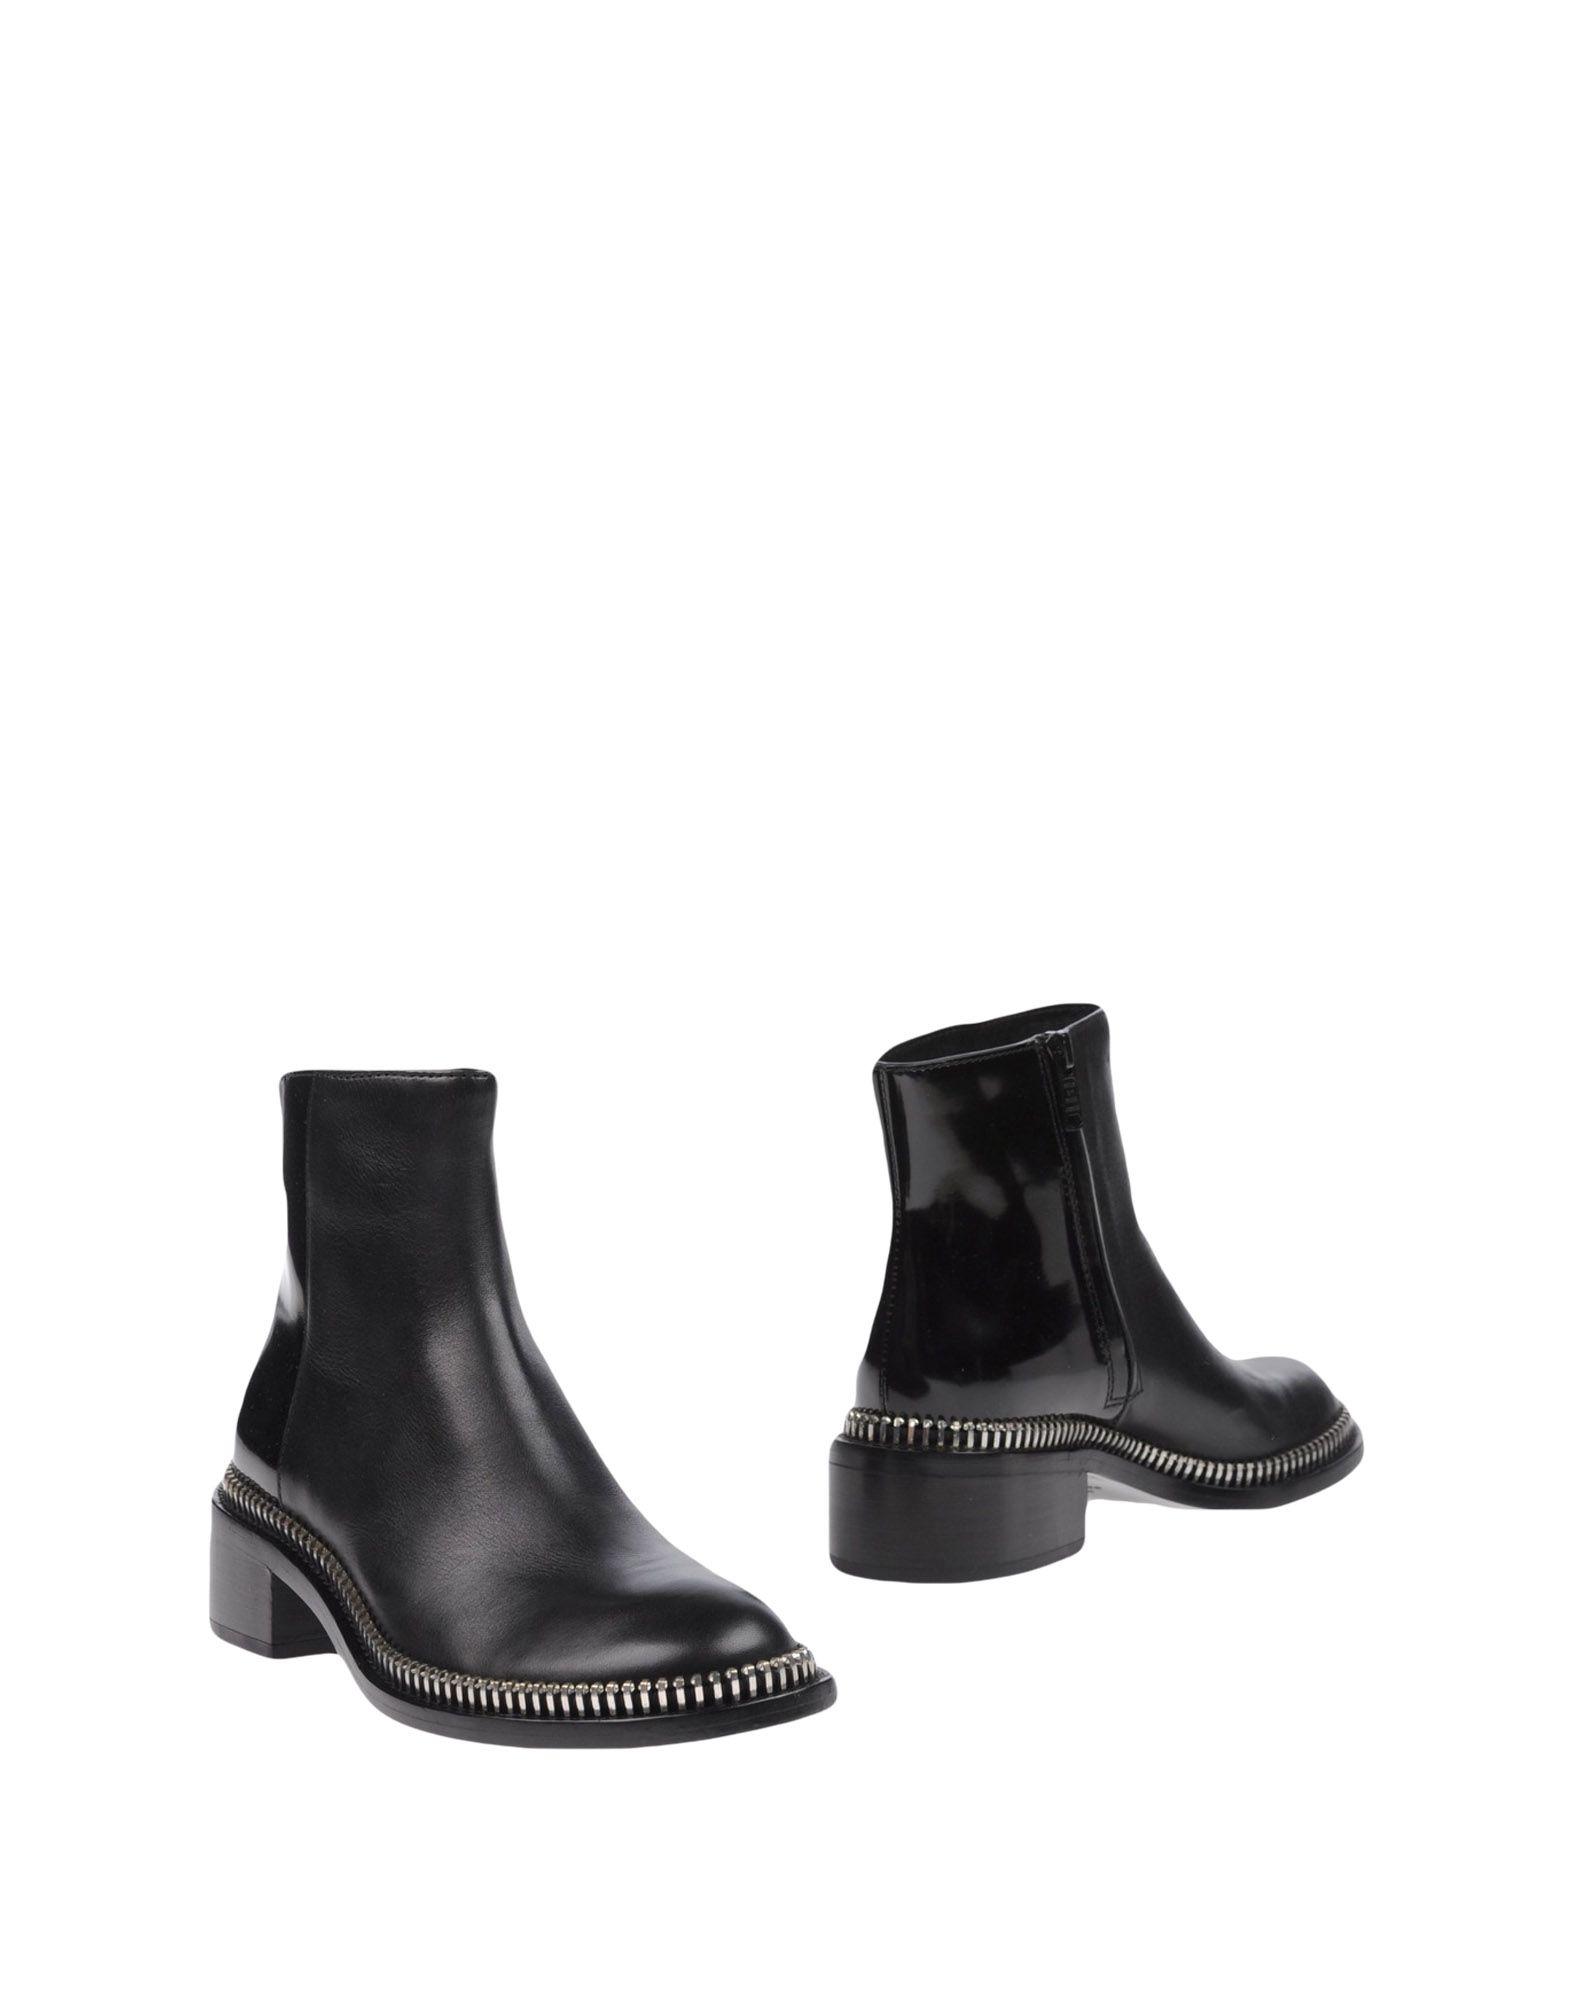 Marc By Marc Jacobs Stiefelette Damen  11224591LBGut aussehende strapazierfähige Schuhe